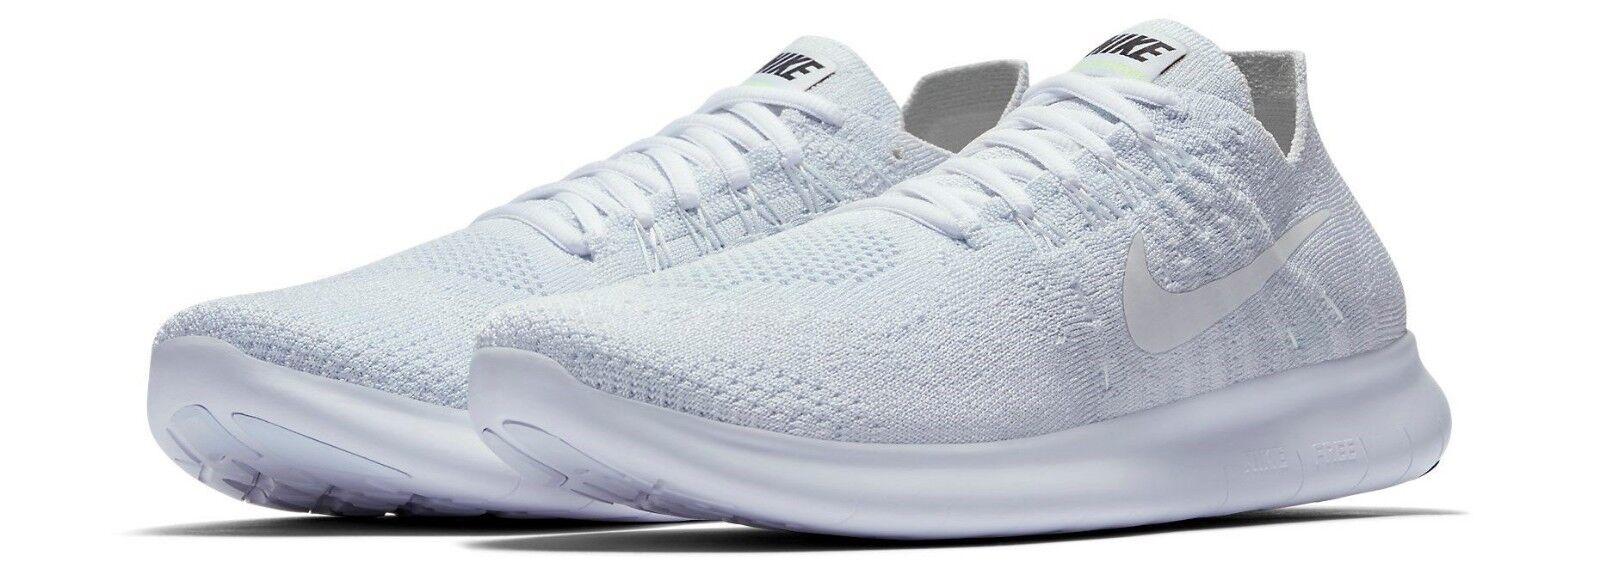 Nike Free RN Flyknit 2017 White Pure PLT 880844 100 Women's Running shoes SZ 11